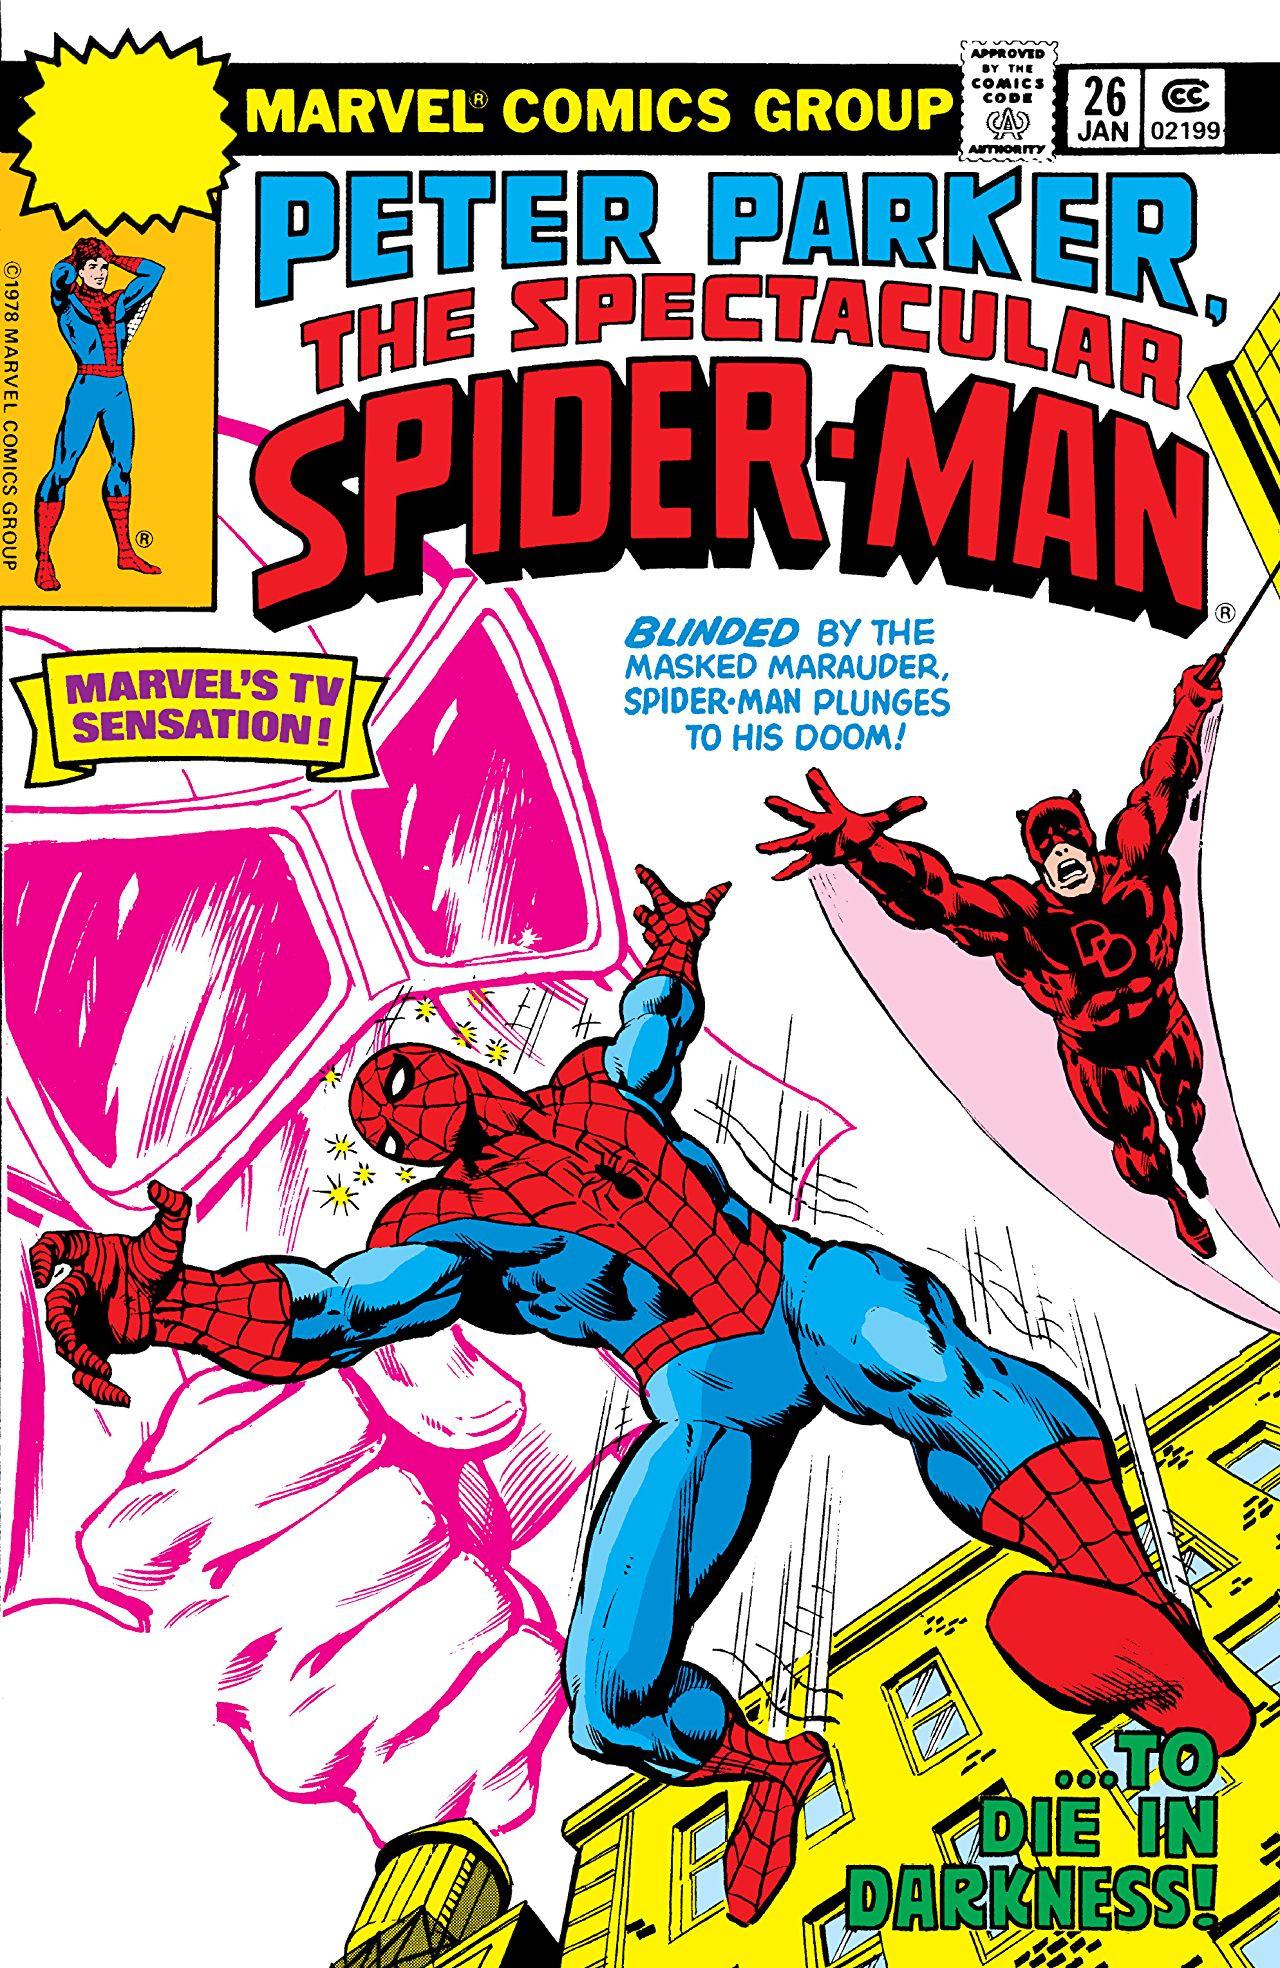 Peter Parker, The Spectacular Spider-Man Vol 1 26.jpg